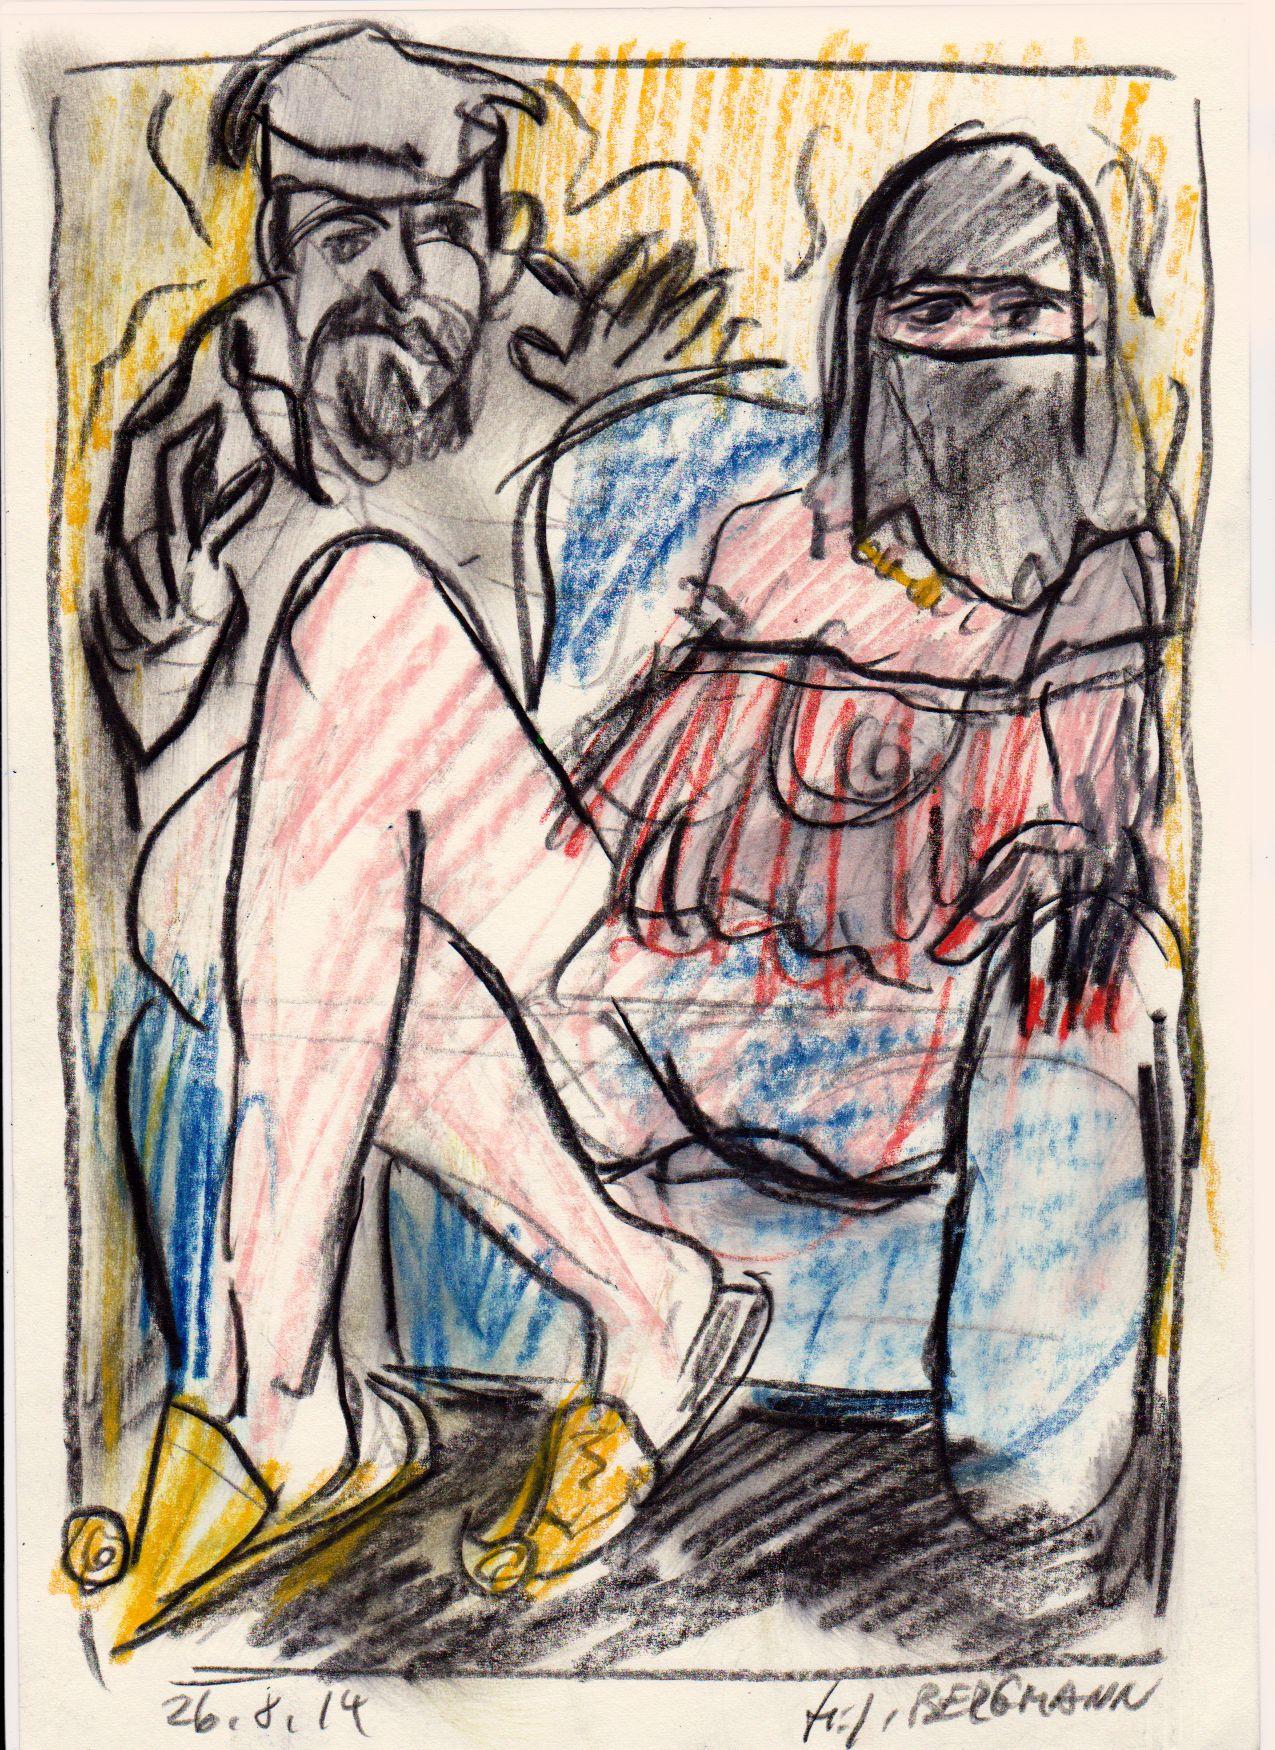 """Der Alte"" Drawing by H.-J. BERGMANN"